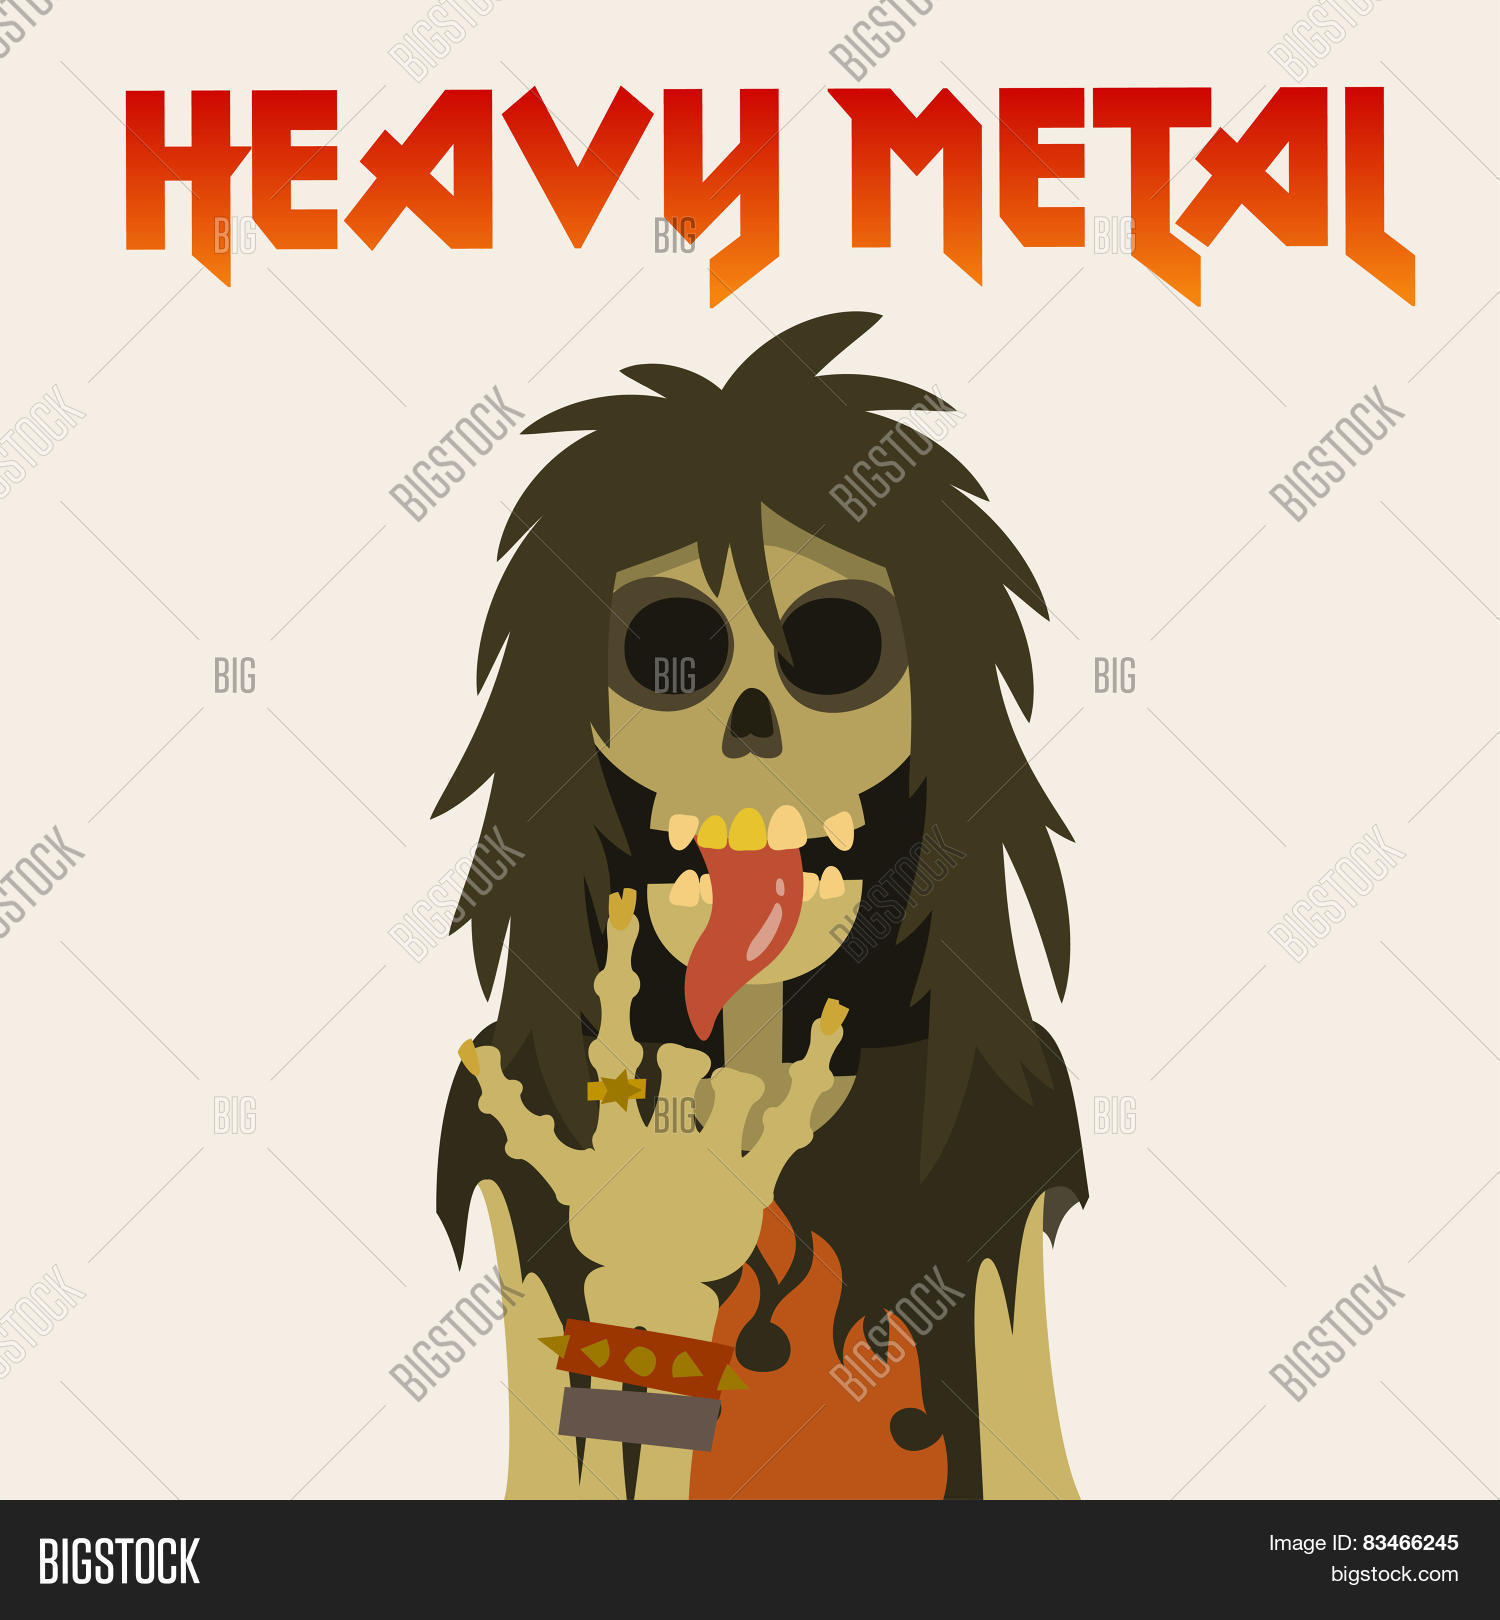 Heavy Metal Skeleton Vector Photo Free Trial Bigstock